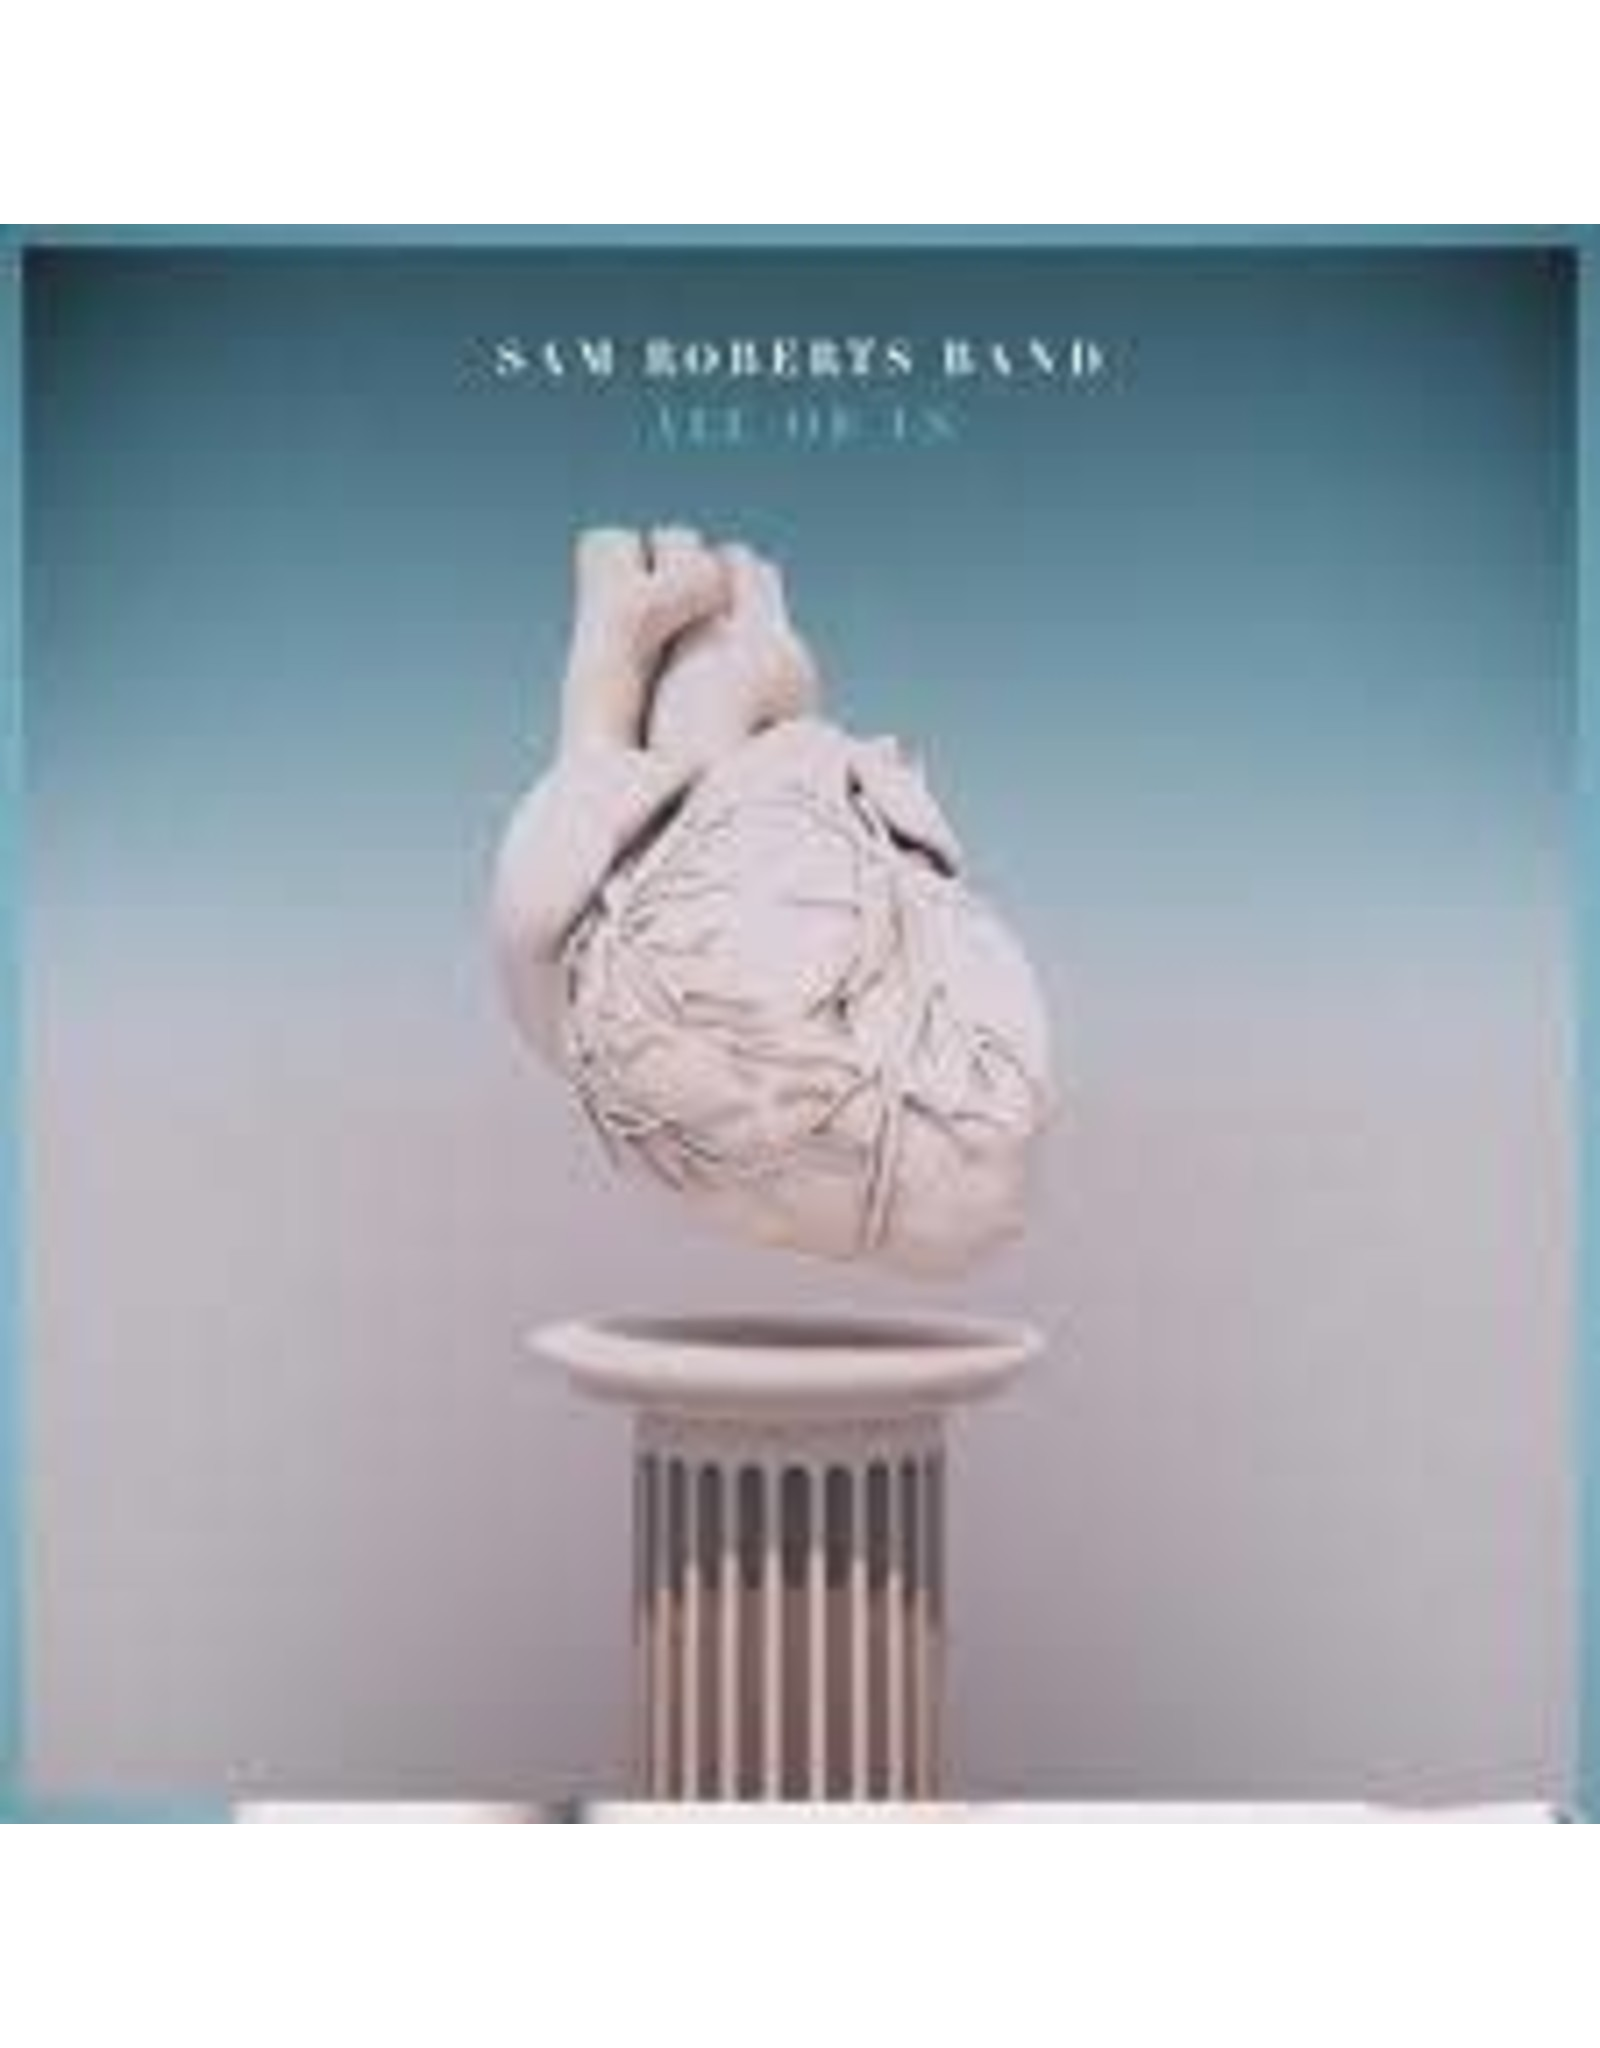 Roberts, Sam - All Of Us CD